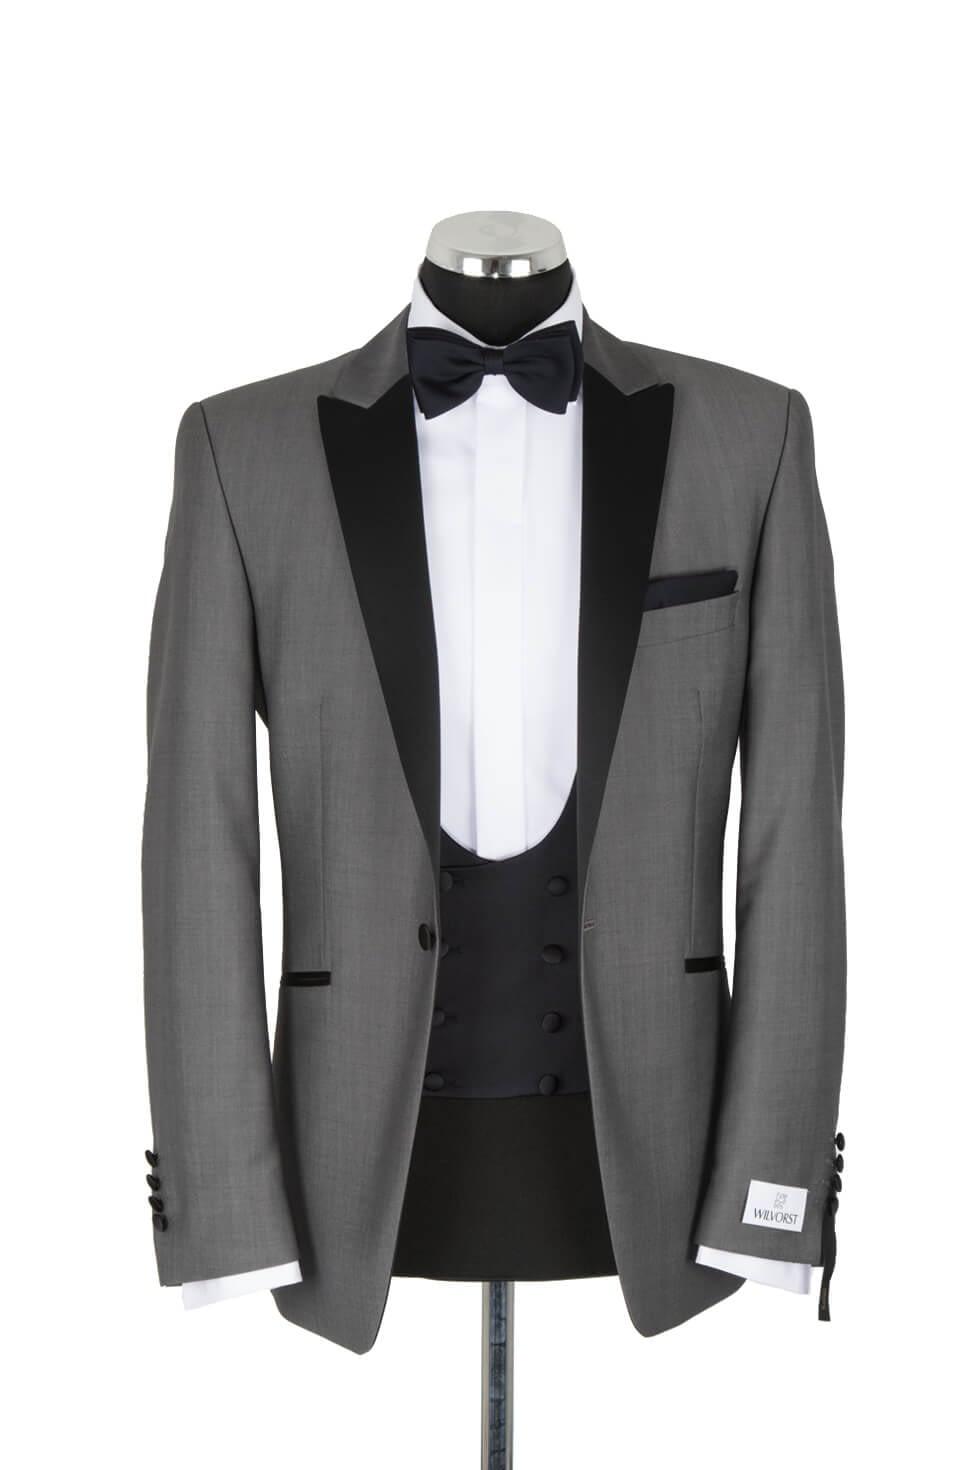 Wilvorst Grey Evening Suit